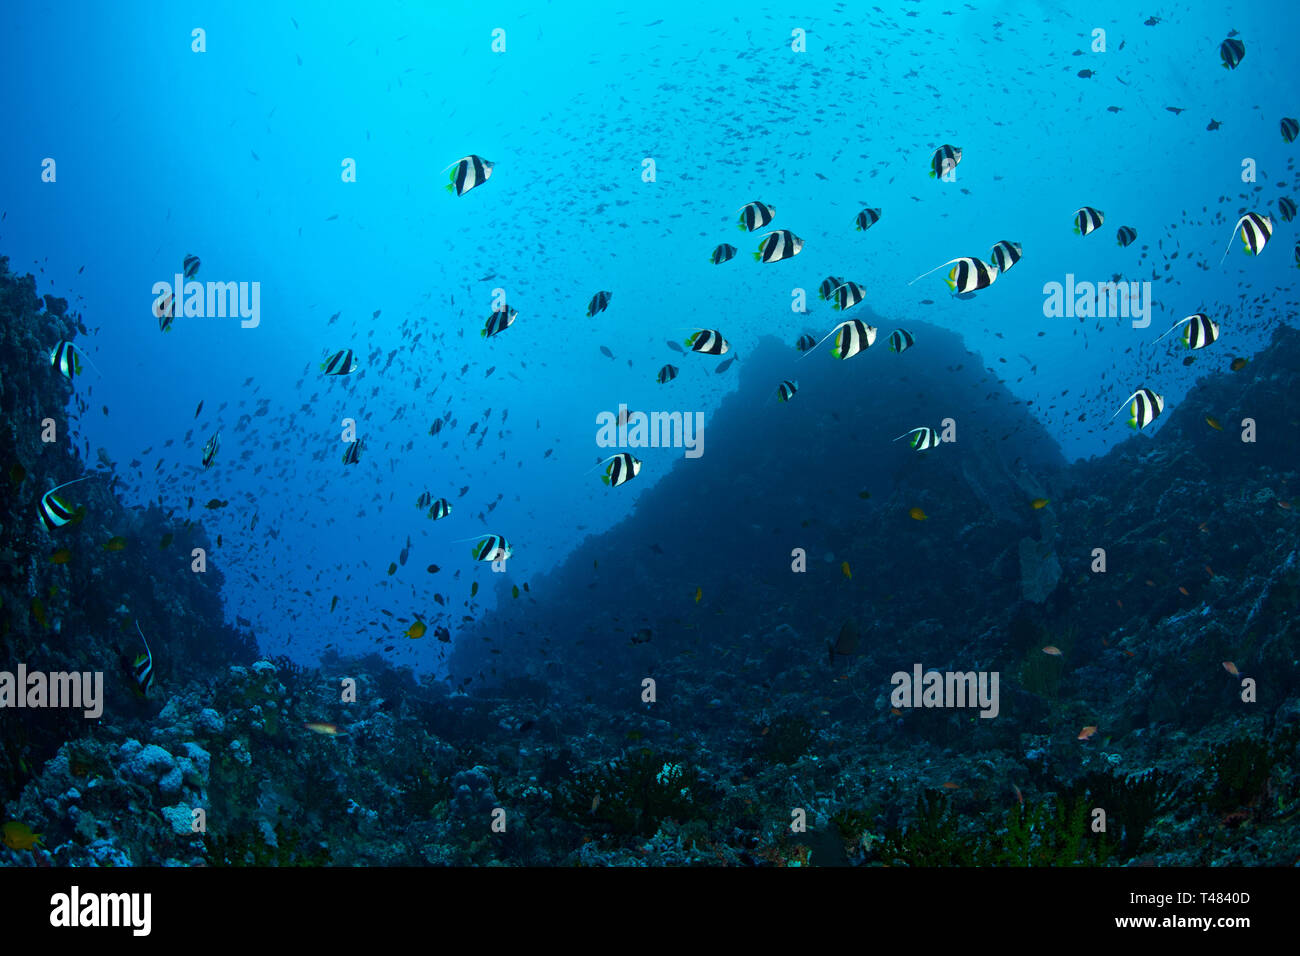 School of Bannerfish, Heniochus diphreutes, in canyon seascape, Verde Island Passage, Philippines. Stock Photo